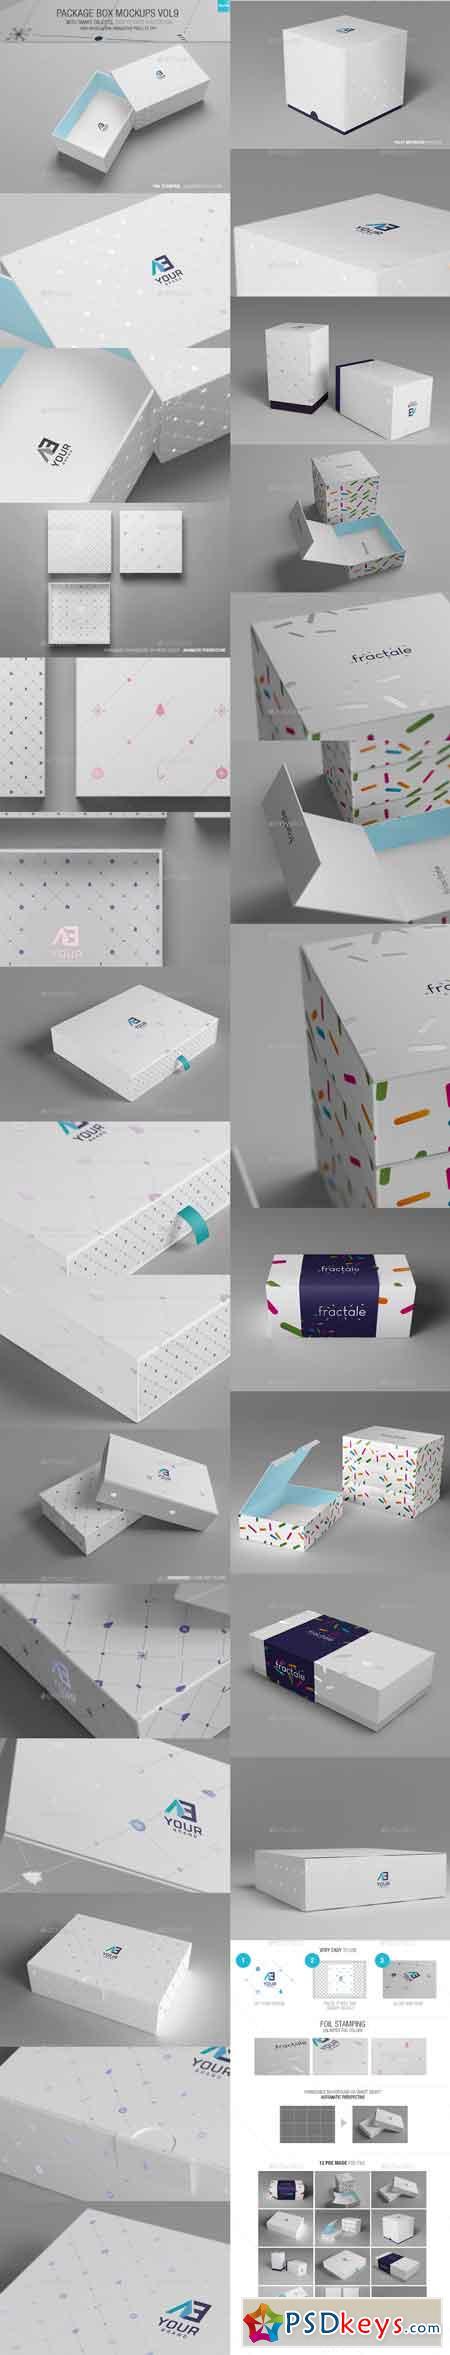 Package Box Mockups Vol9 13547117